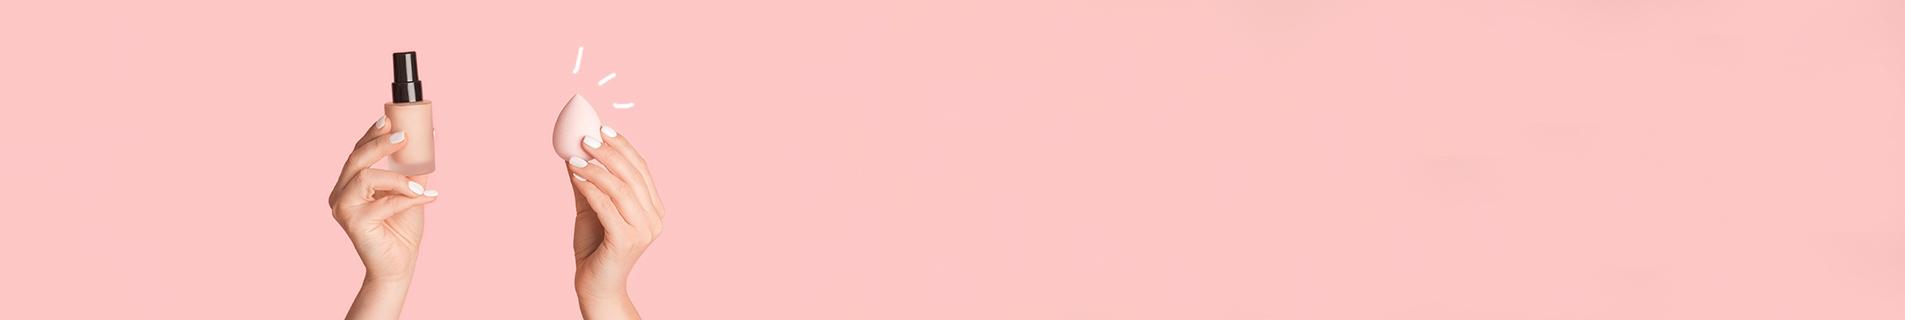 Bases & fixateurs teint|Maquillage de marque pas cher - SAGA Cosmetics